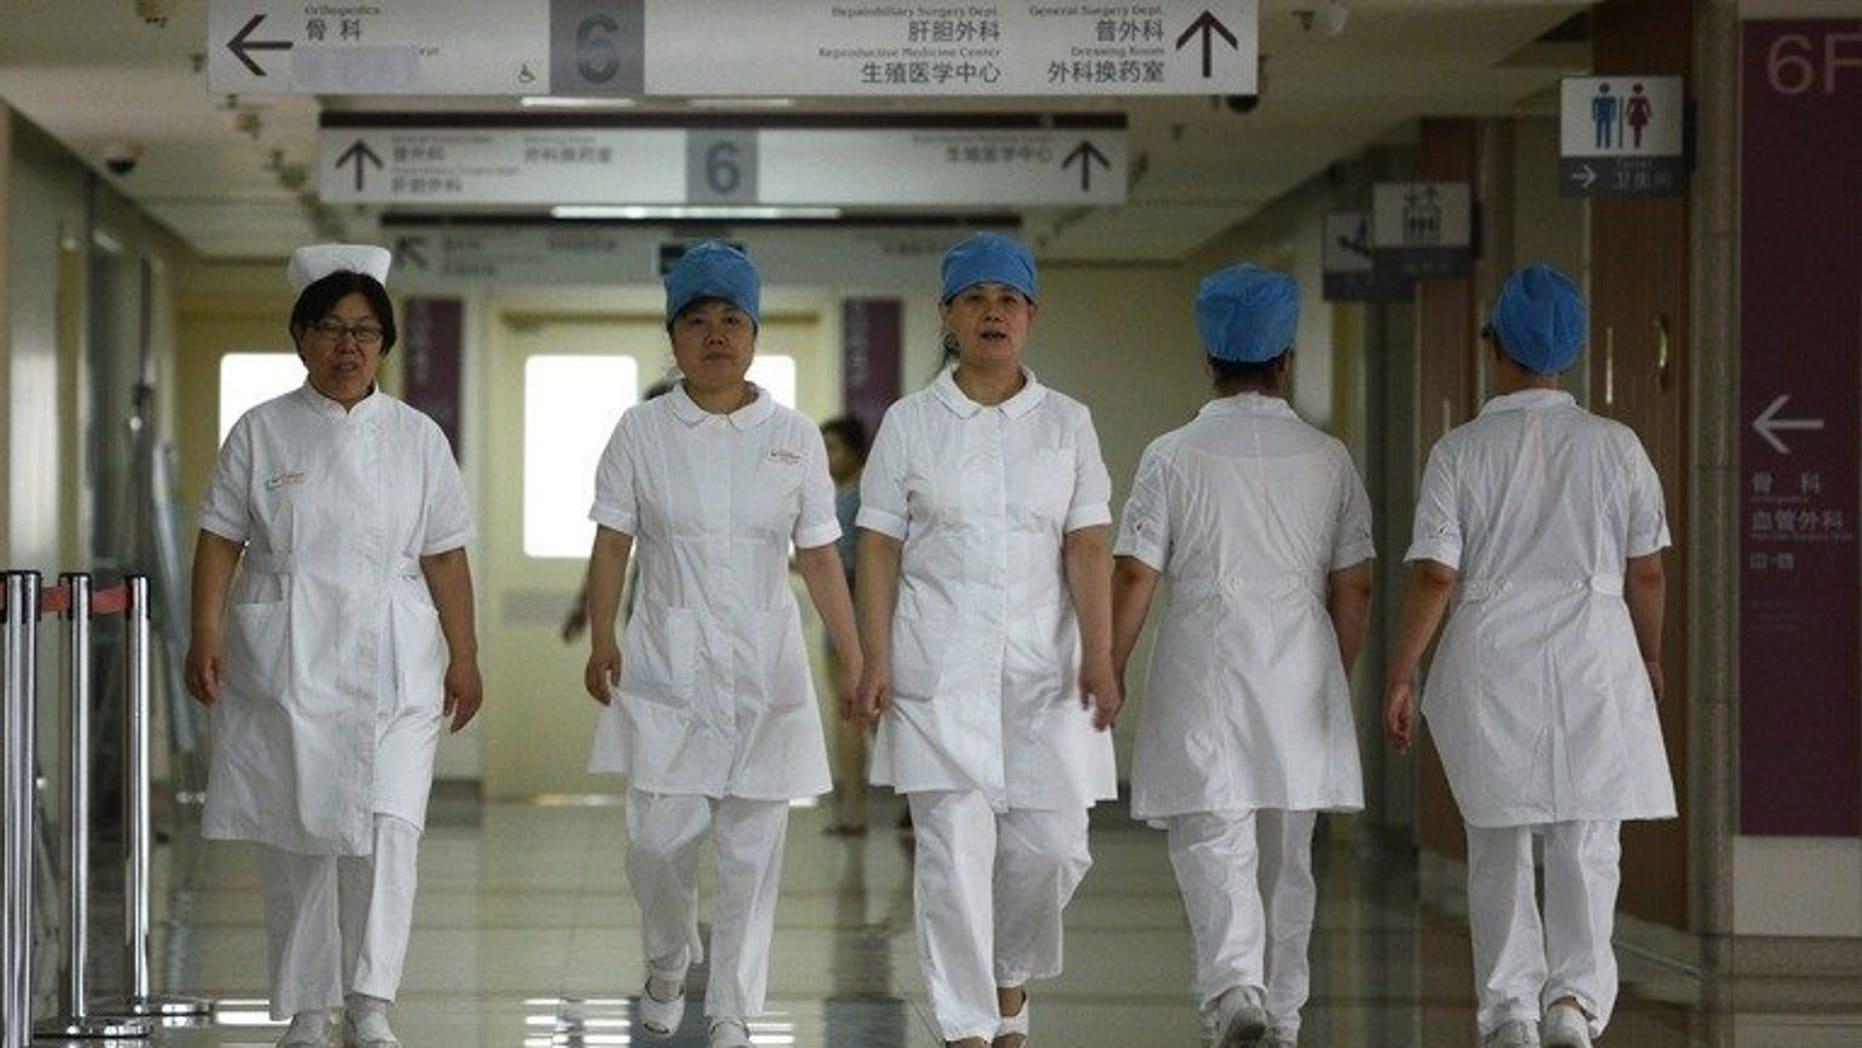 Illustration: a group of nurses walks along a corridor at a hospital in Beijing on July 29, 2013.